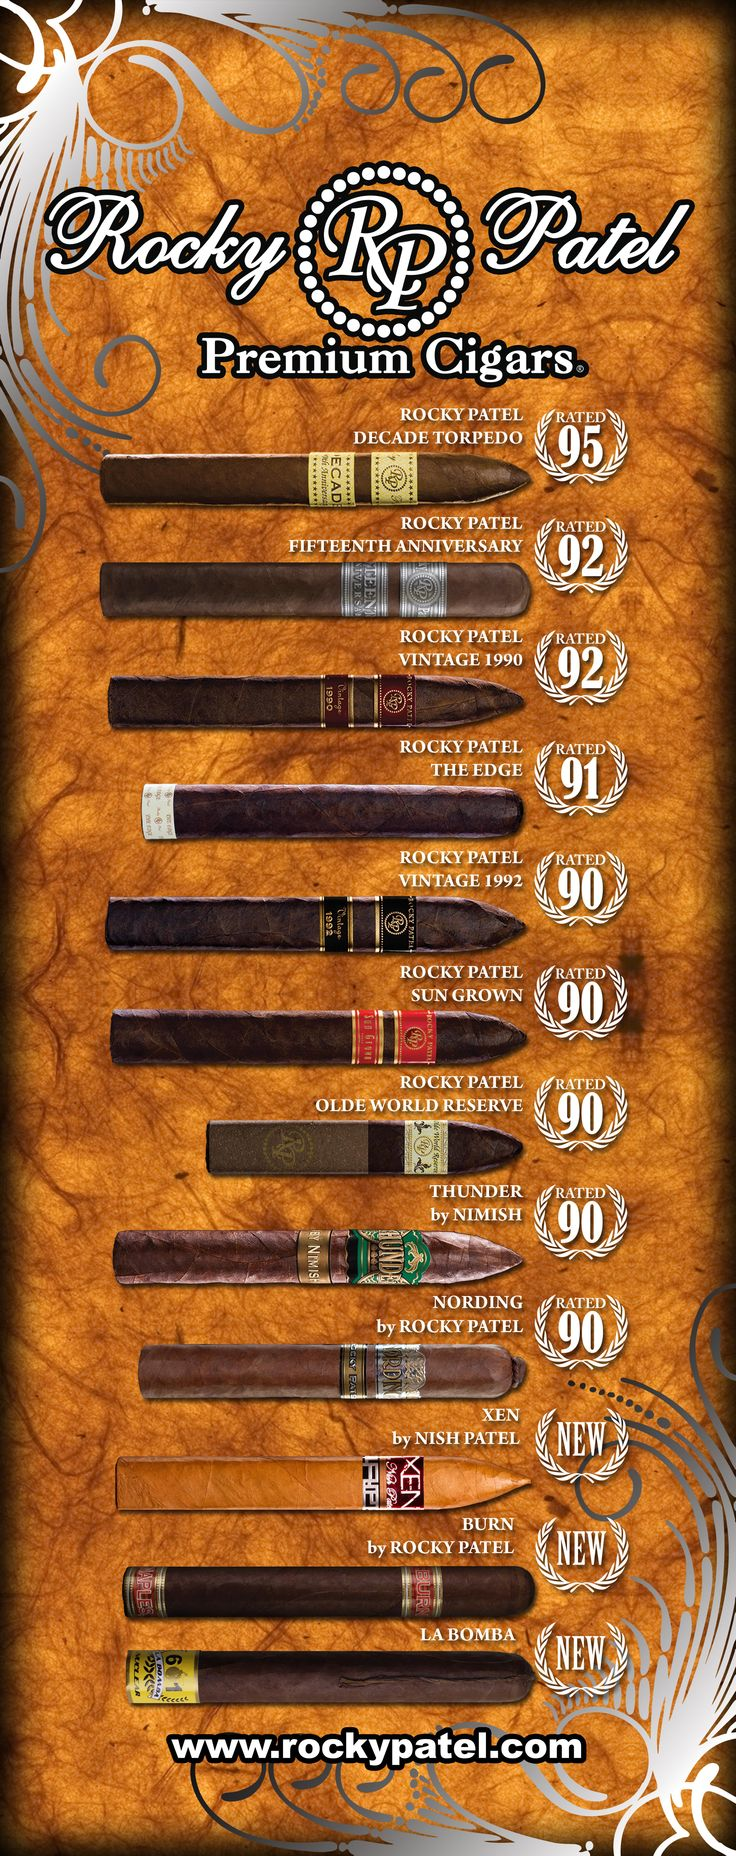 Rocky Patel Cigars & Cigar Ratings